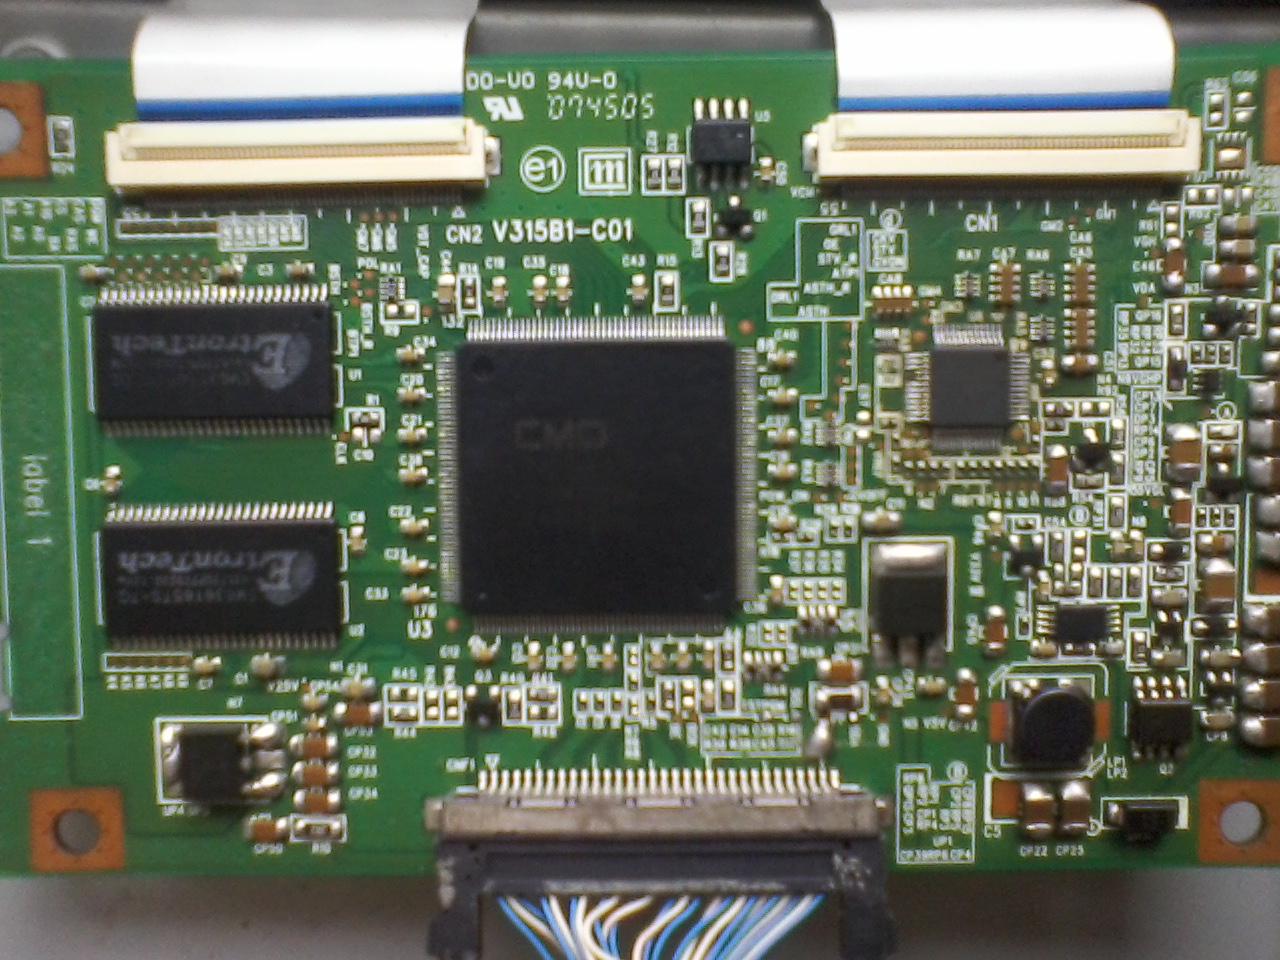 servis elektronik : t-con tv lcd samsug yang sering rusak